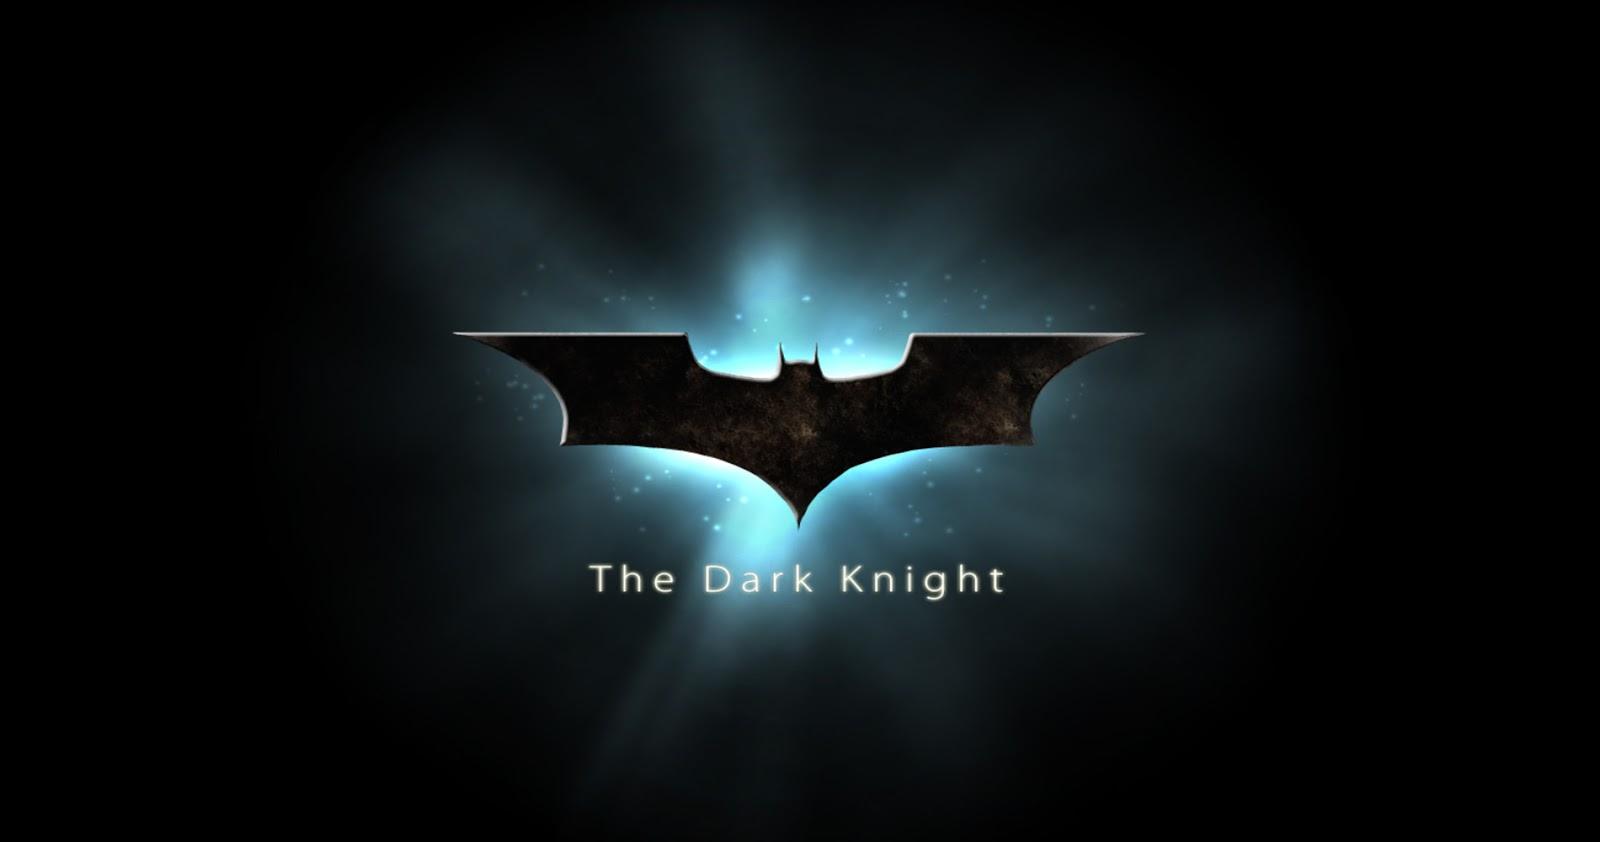 The Dark Knight Wallpapper J 252 R 240 G 240 241 S 235 D 235 241 K